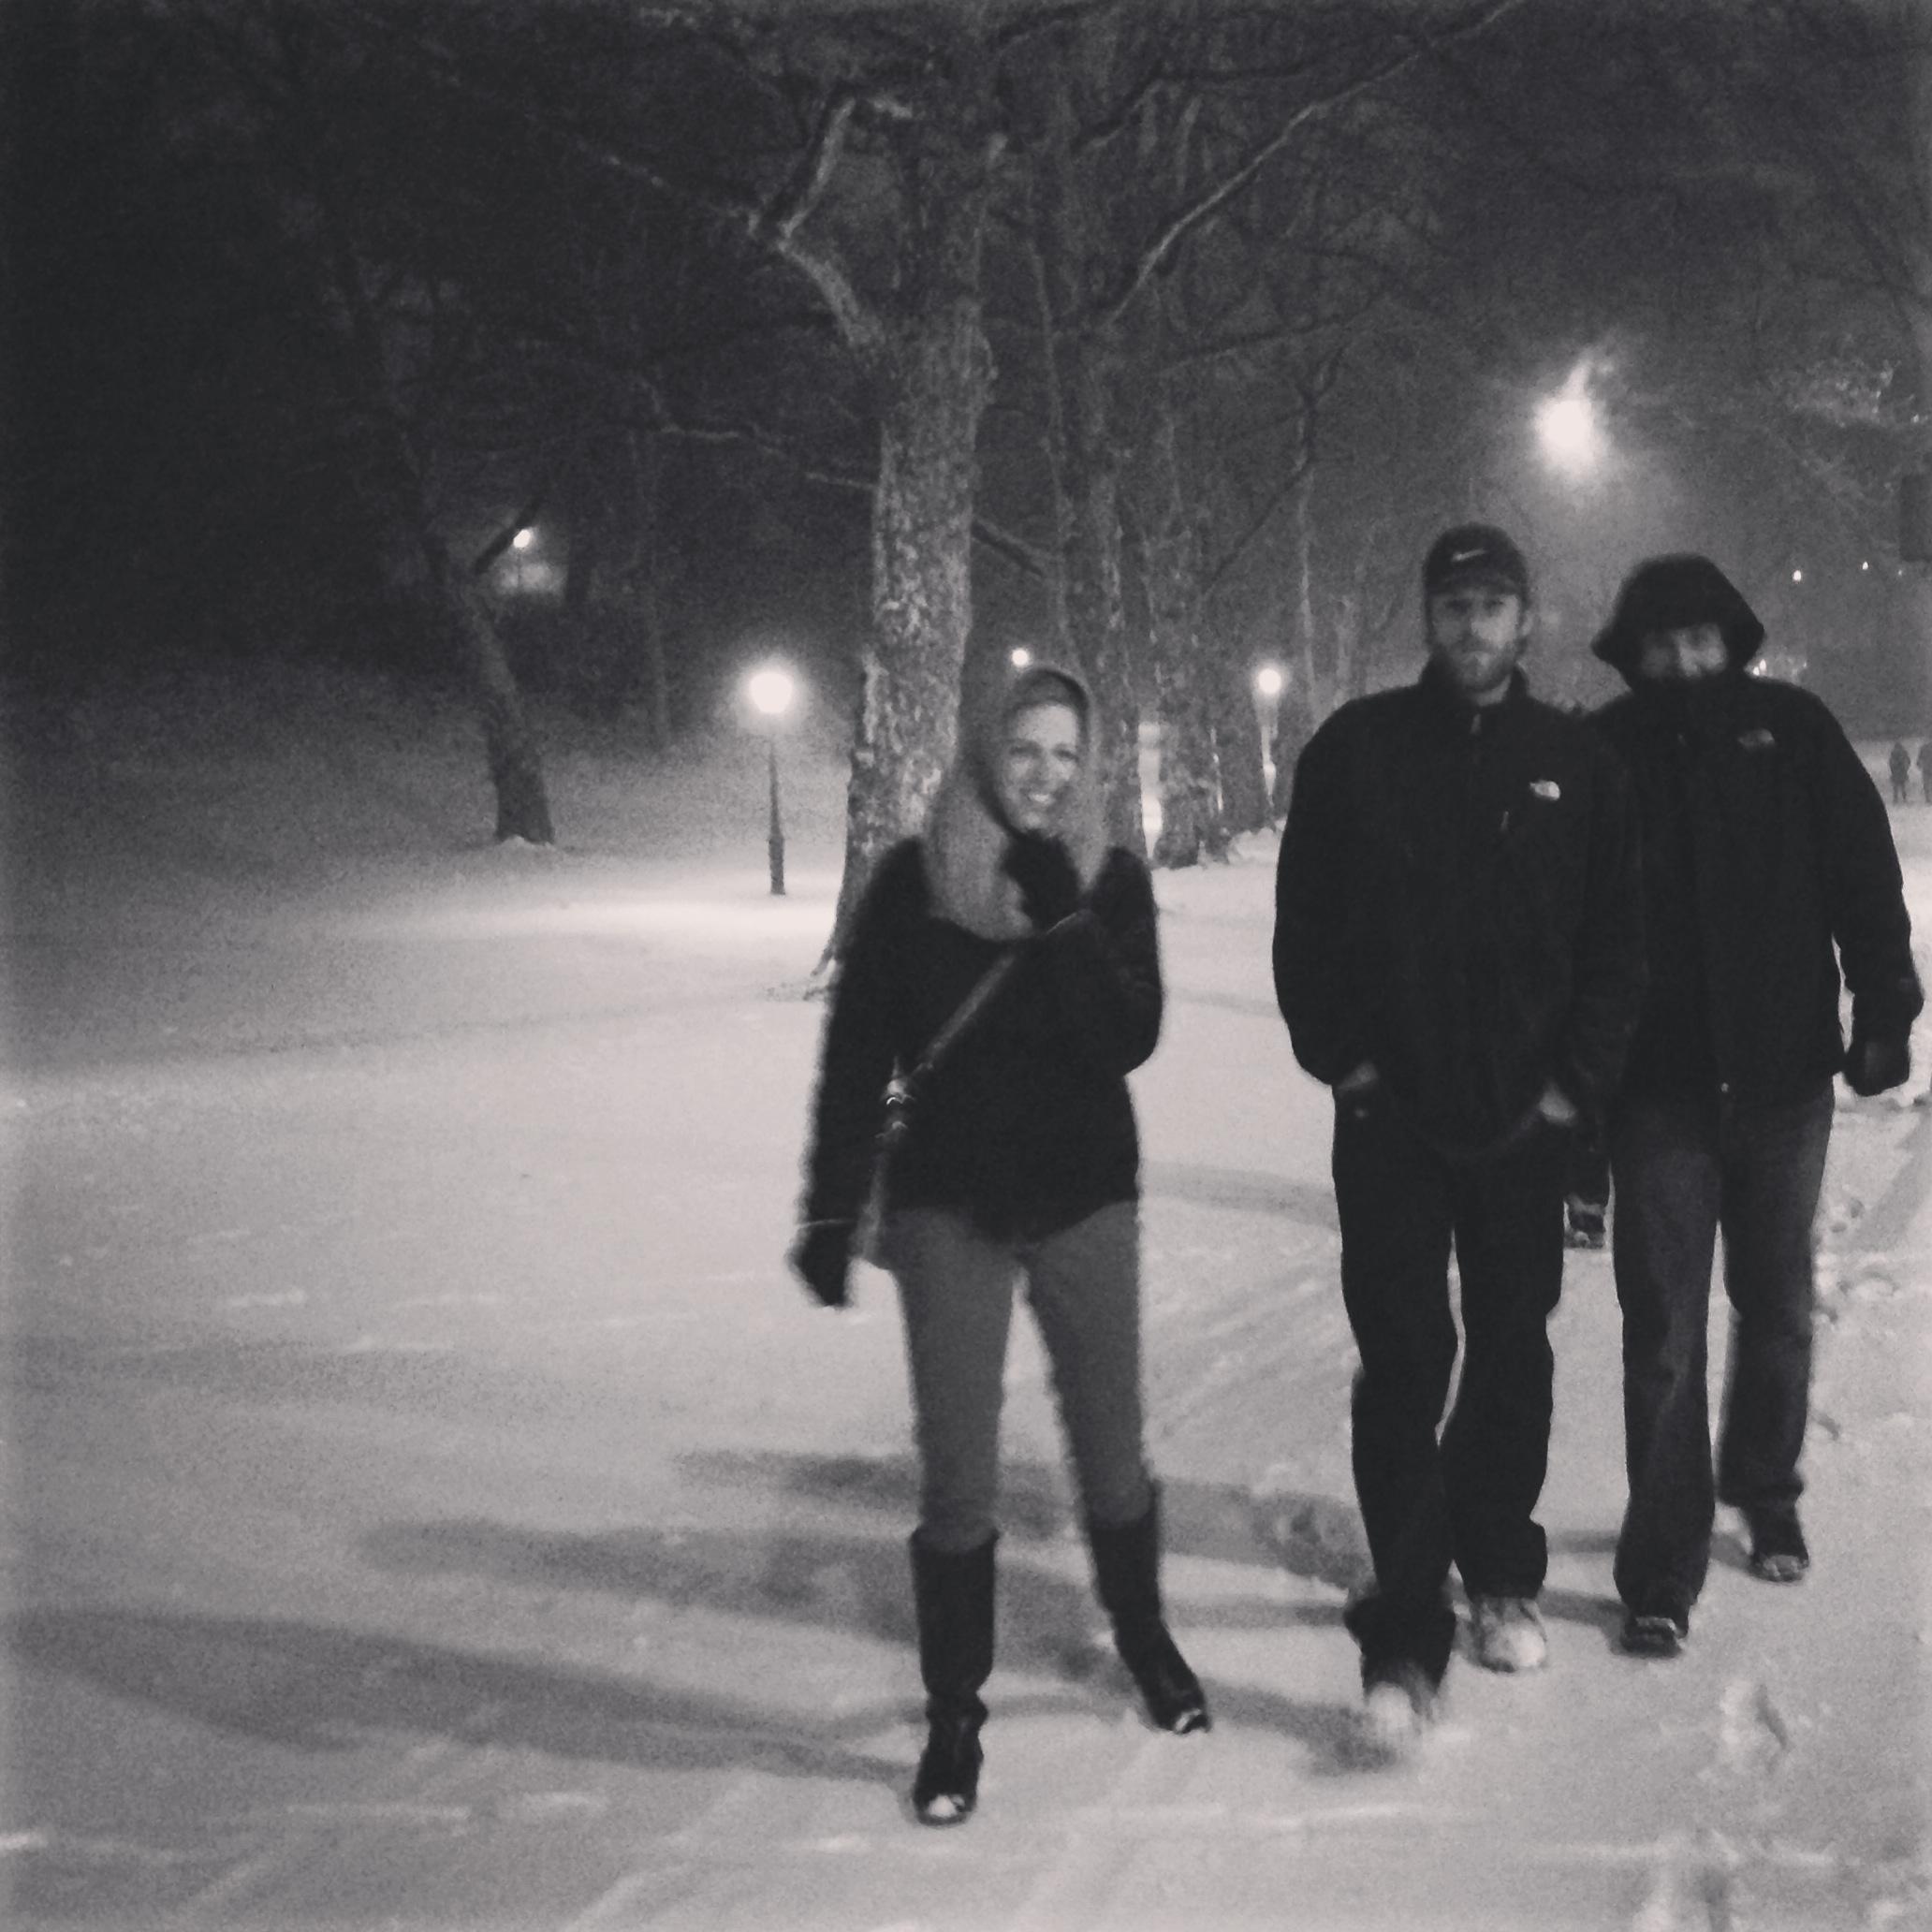 Meaghan, Patrick, Scott Central Park 2013